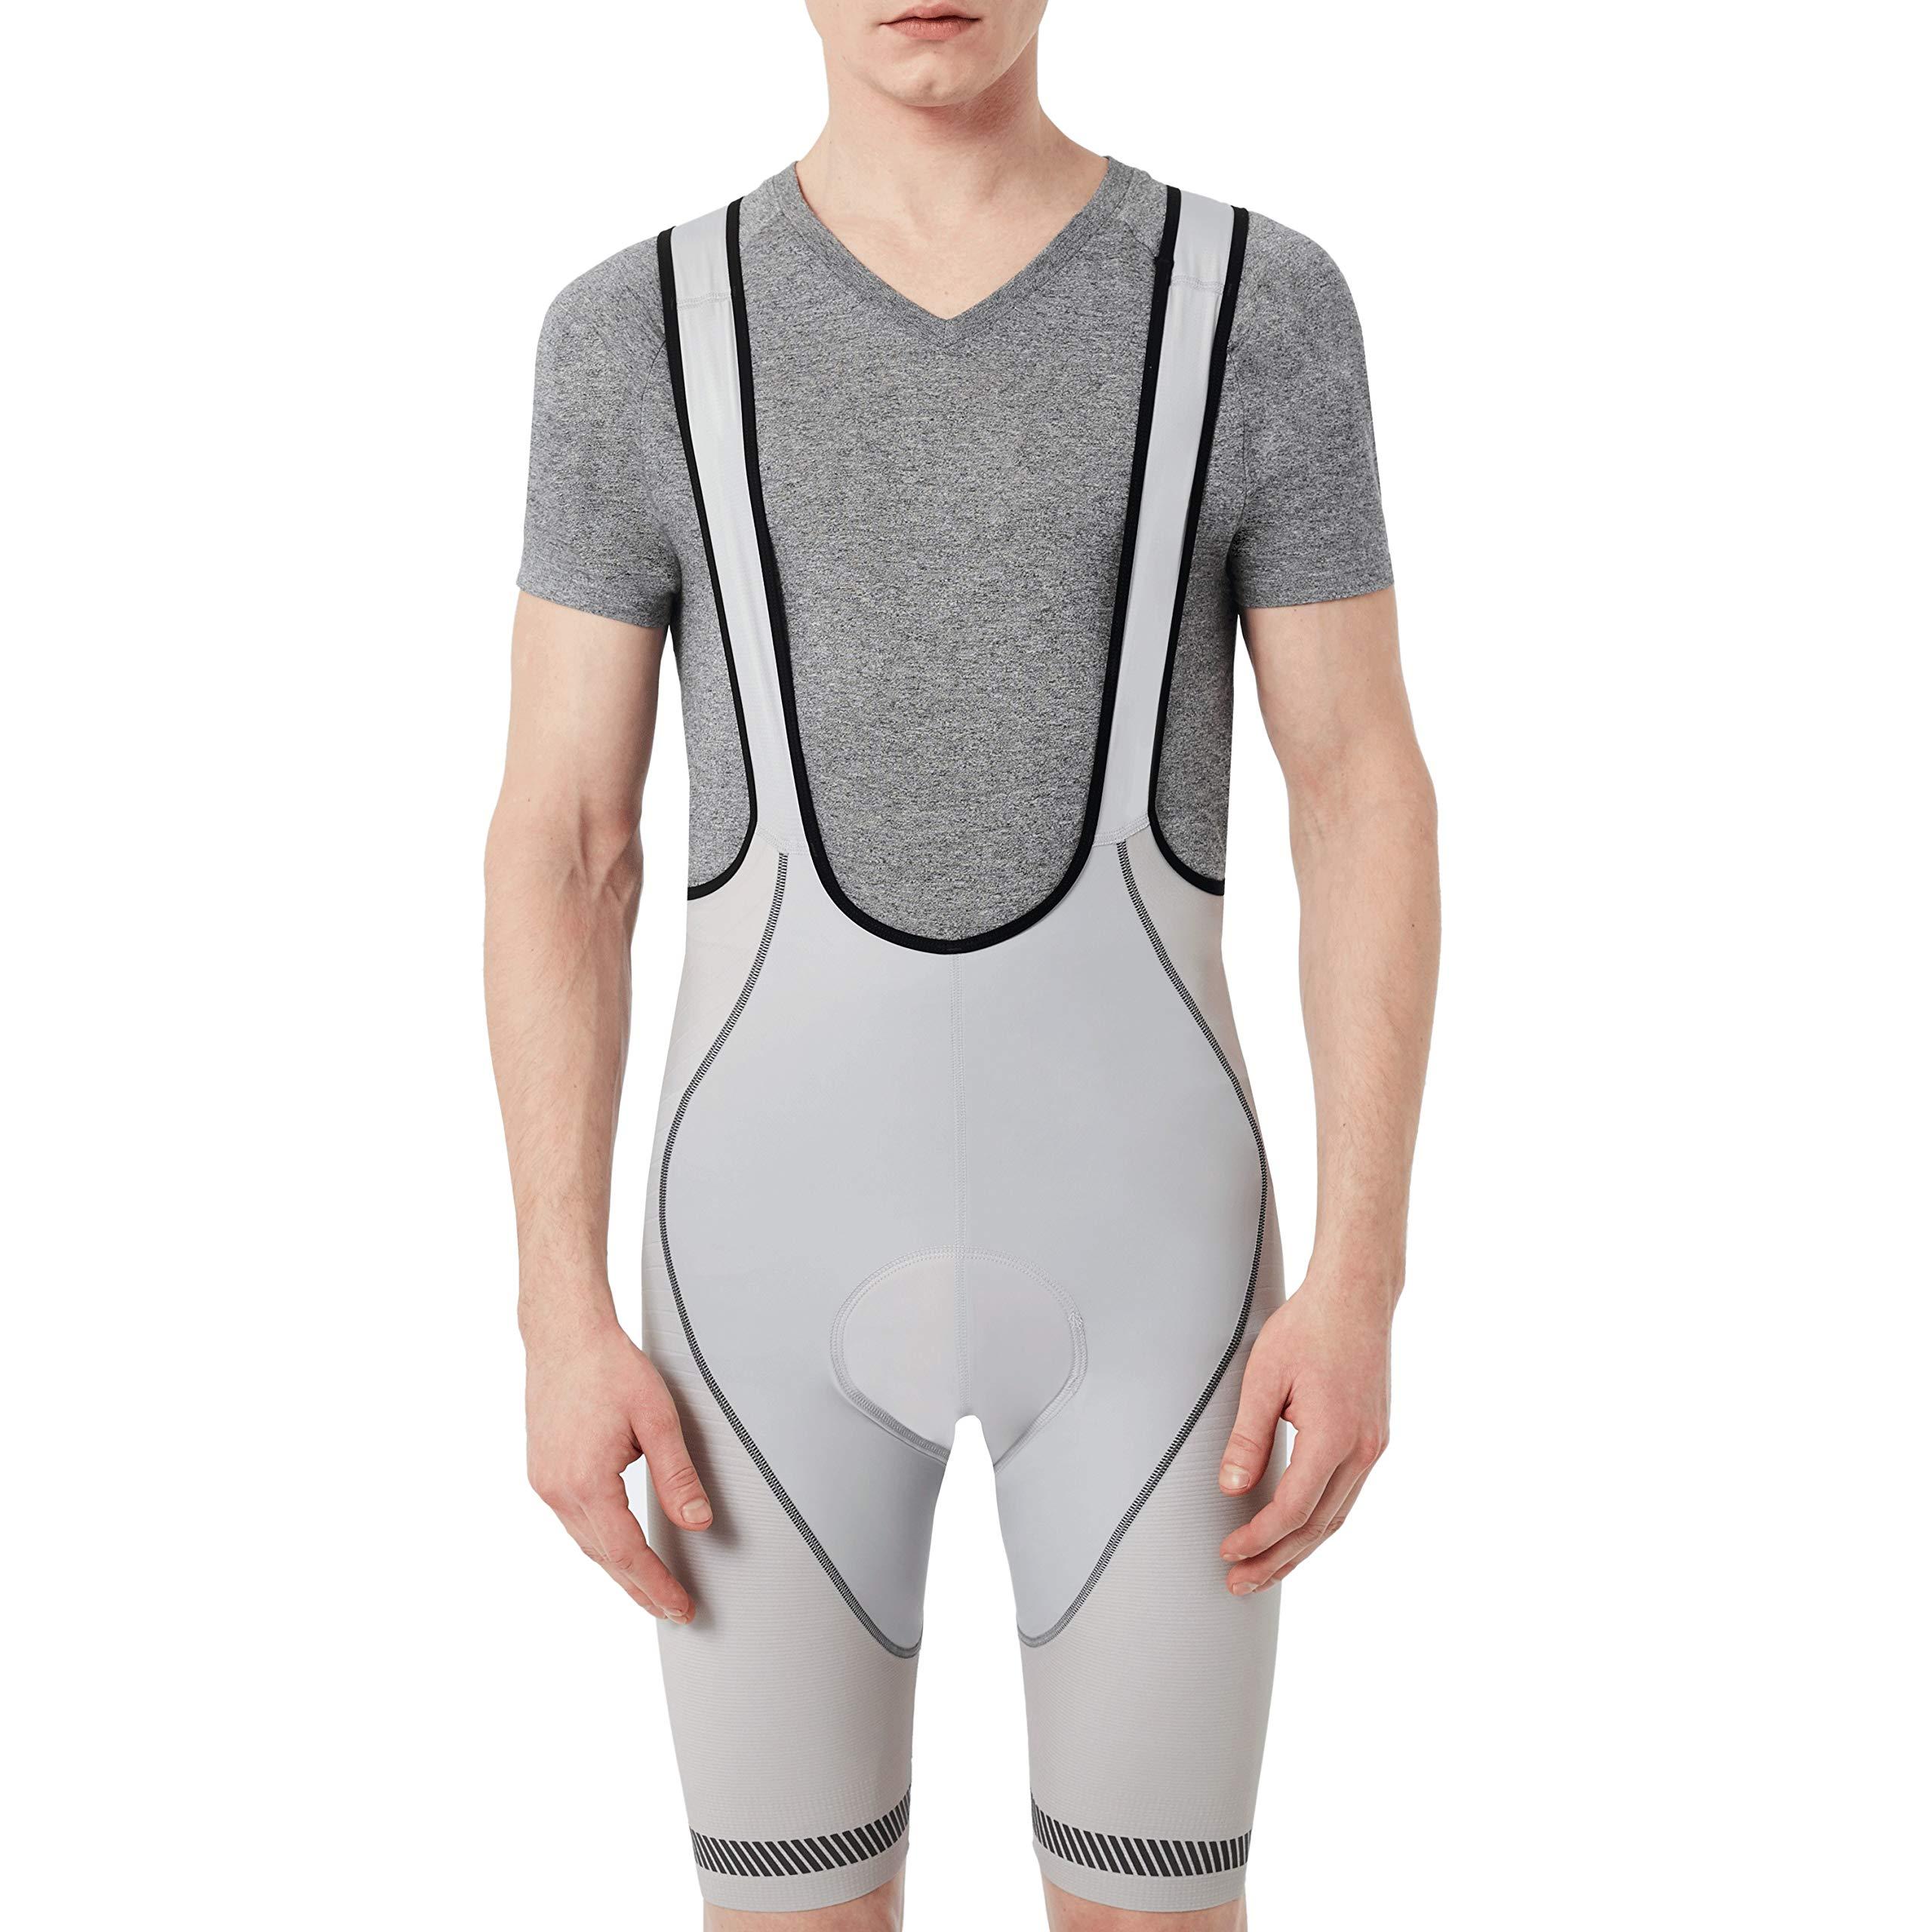 Oakley Men's Jawbreaker Premium Bib Shorts,2X-Large,Stone Gray